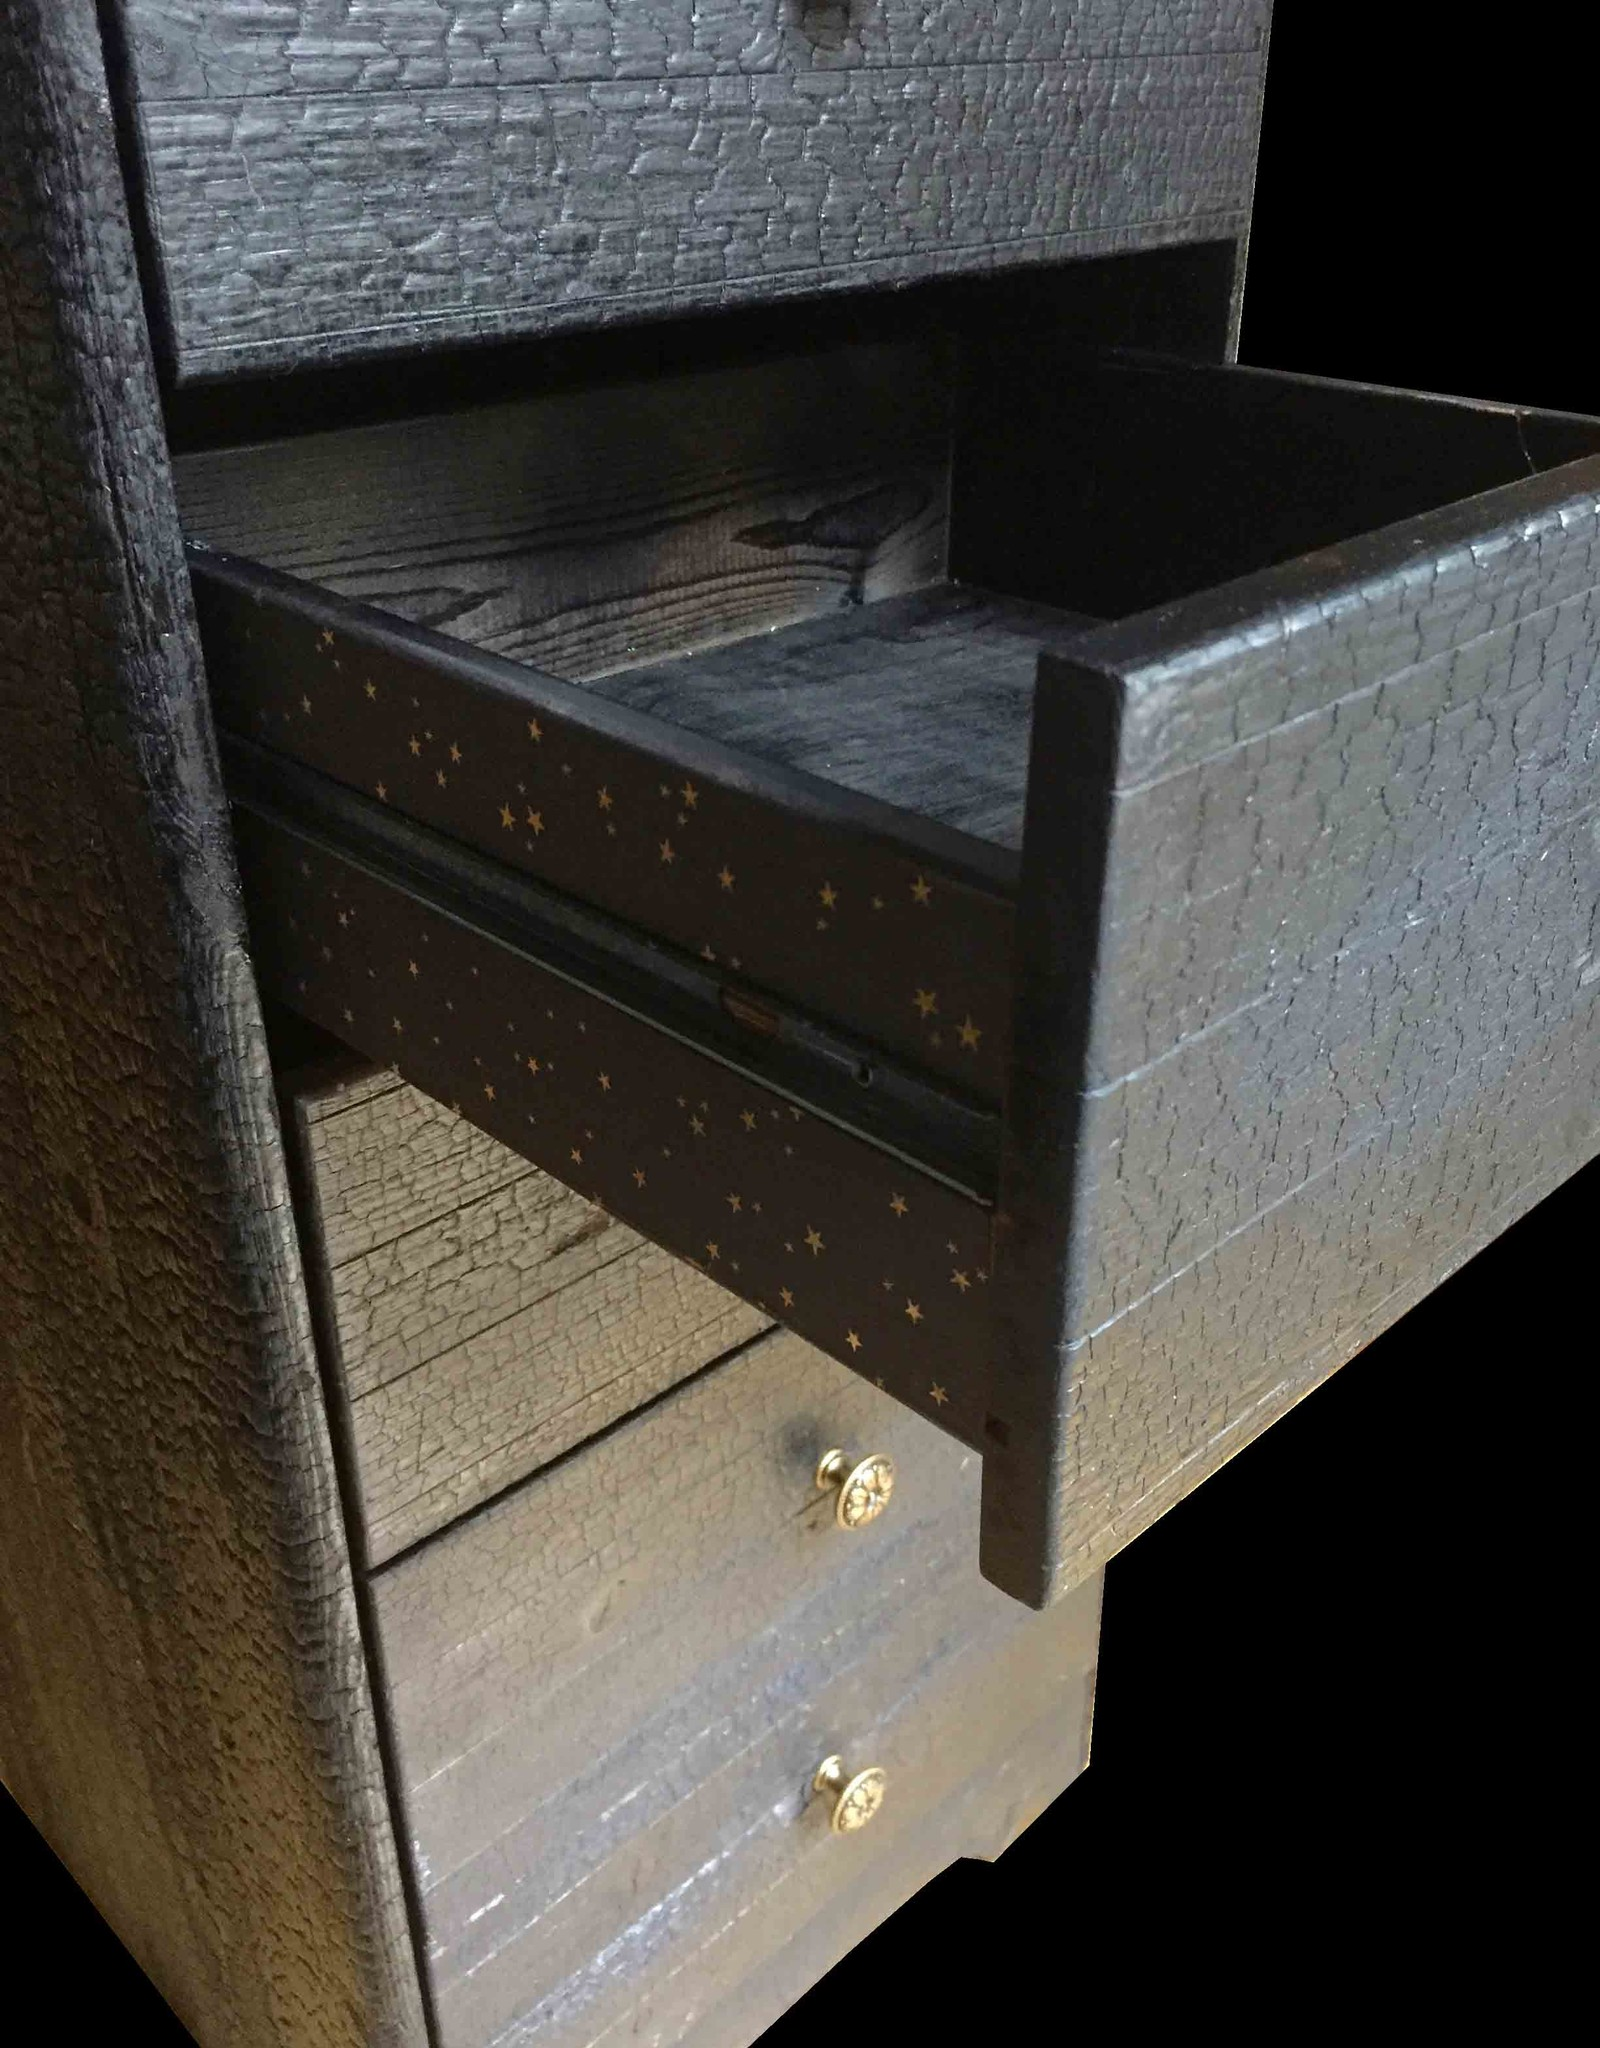 Shou Sugi Ban / Flamed Wood Kommode Schrank Black Lounge